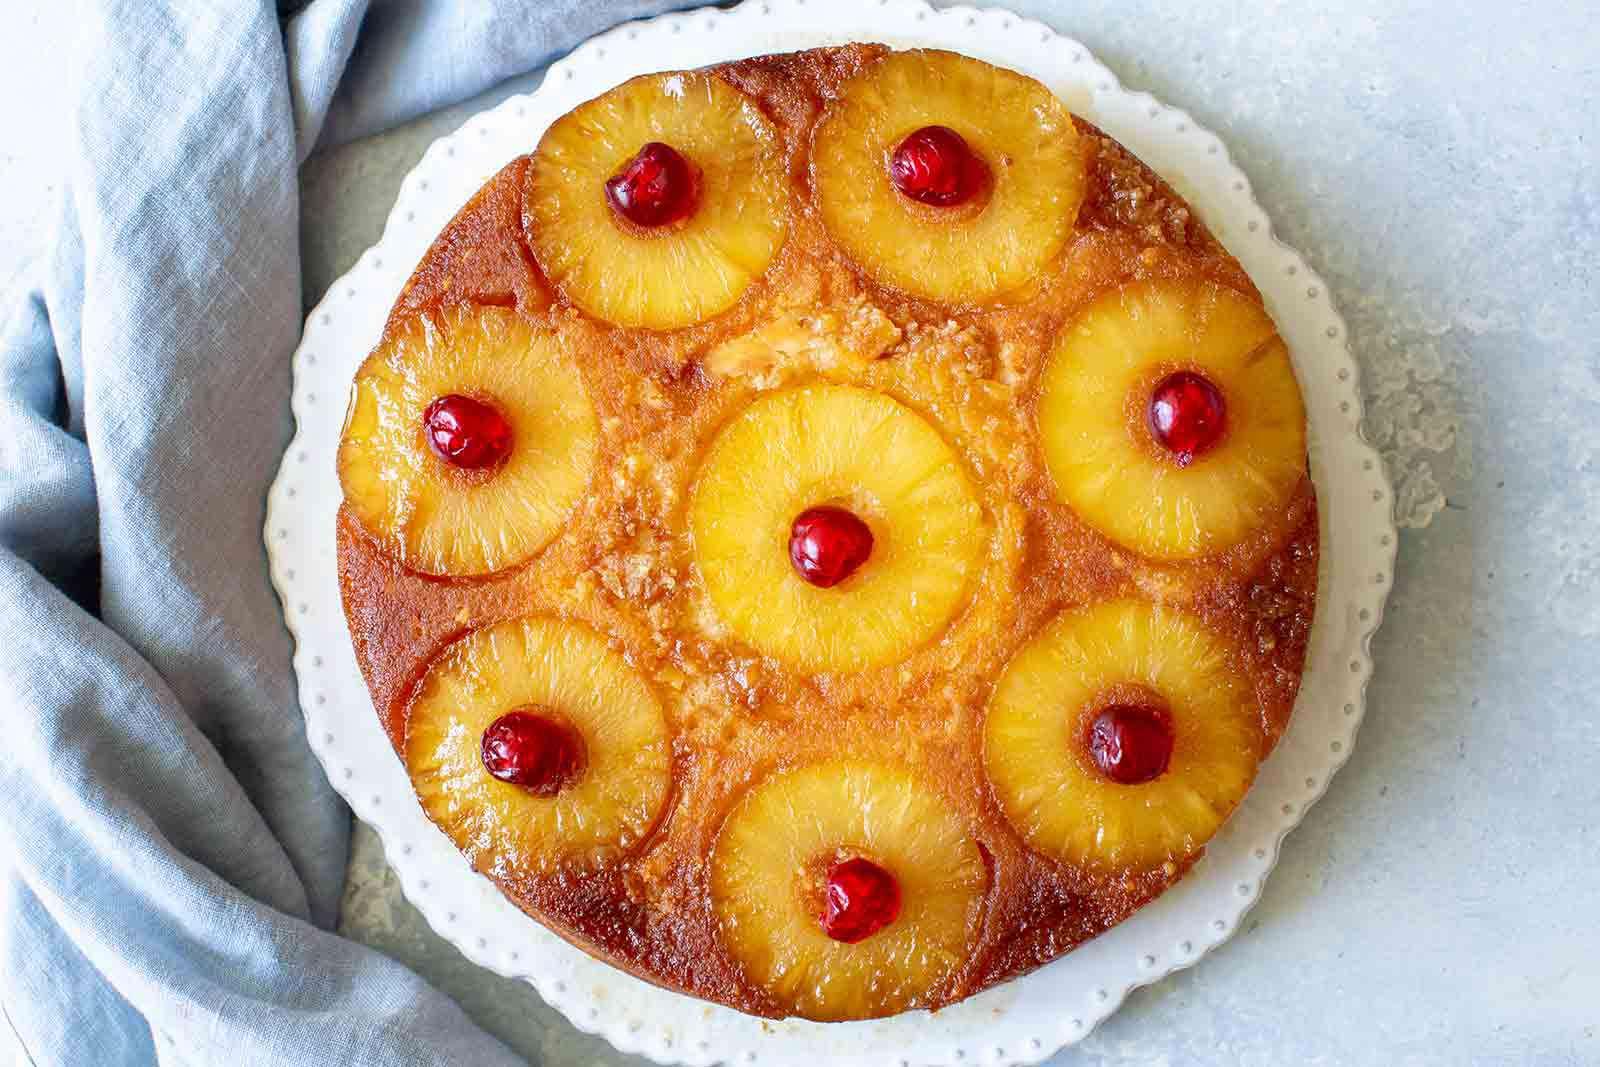 Pineapple Upside Down Cake in pan with cherries